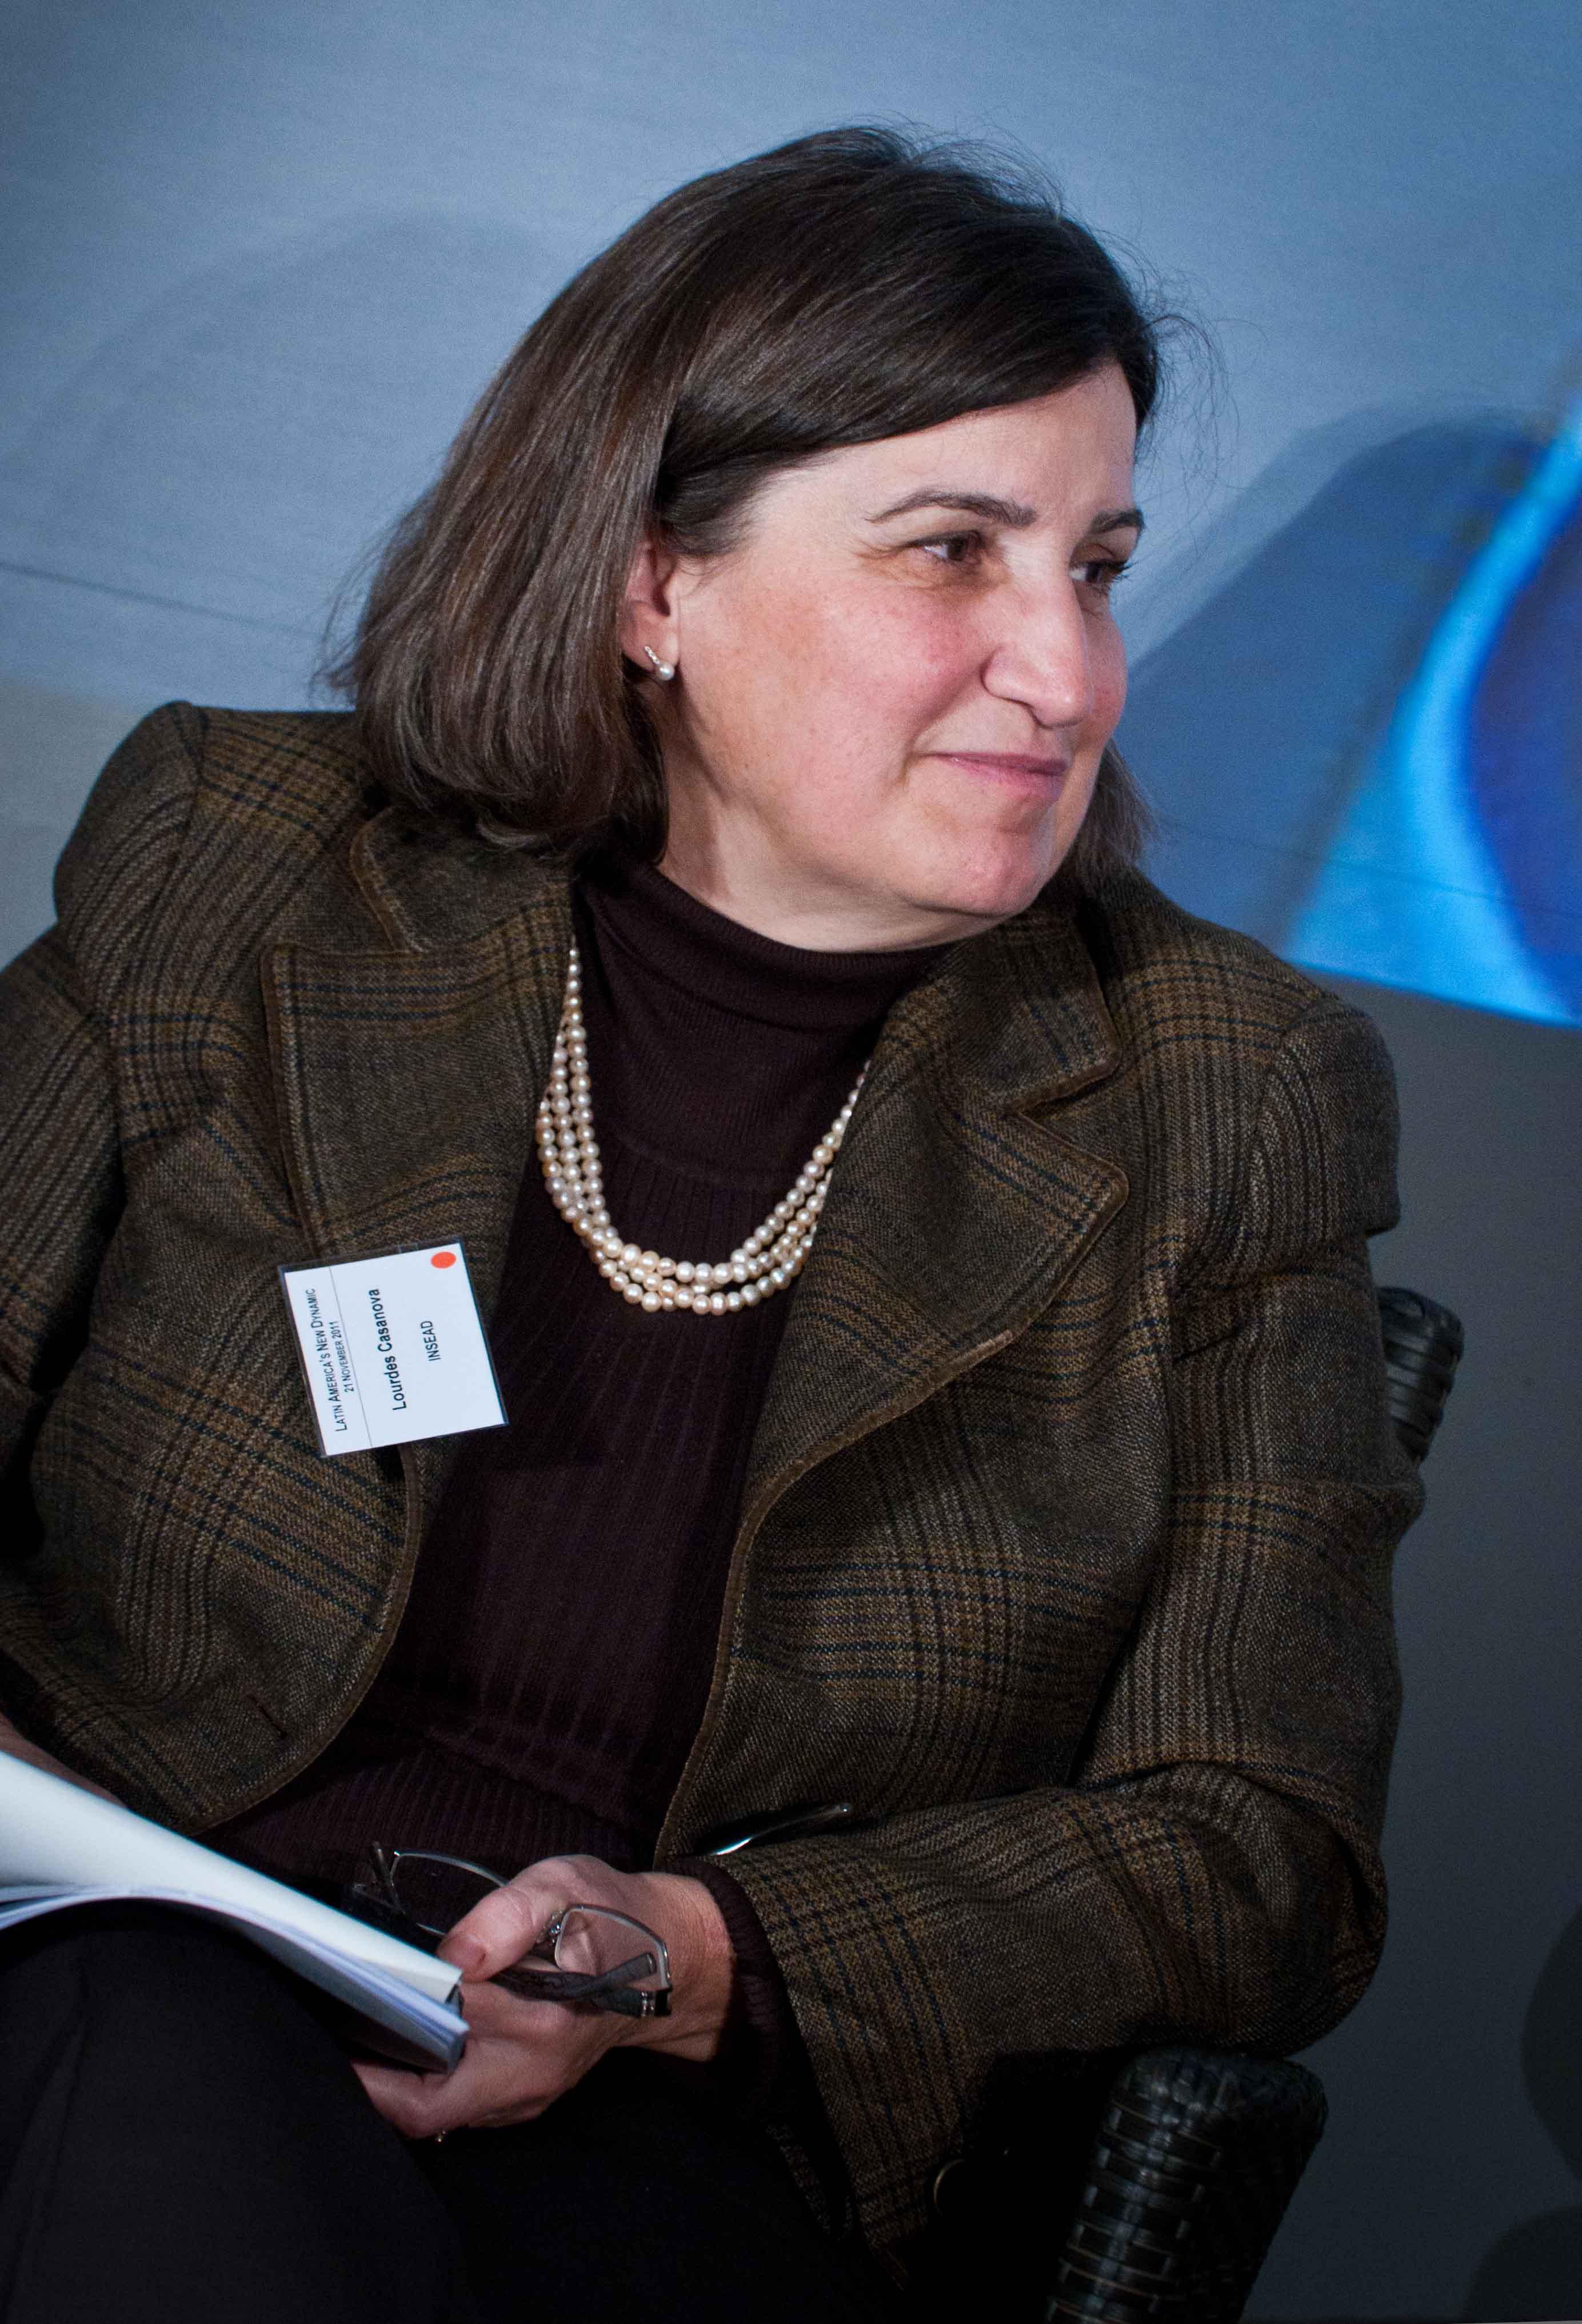 Lourdes_Casanova,_Lecturer_for_Corporate_Management_at_INSEAD_(6385211659)